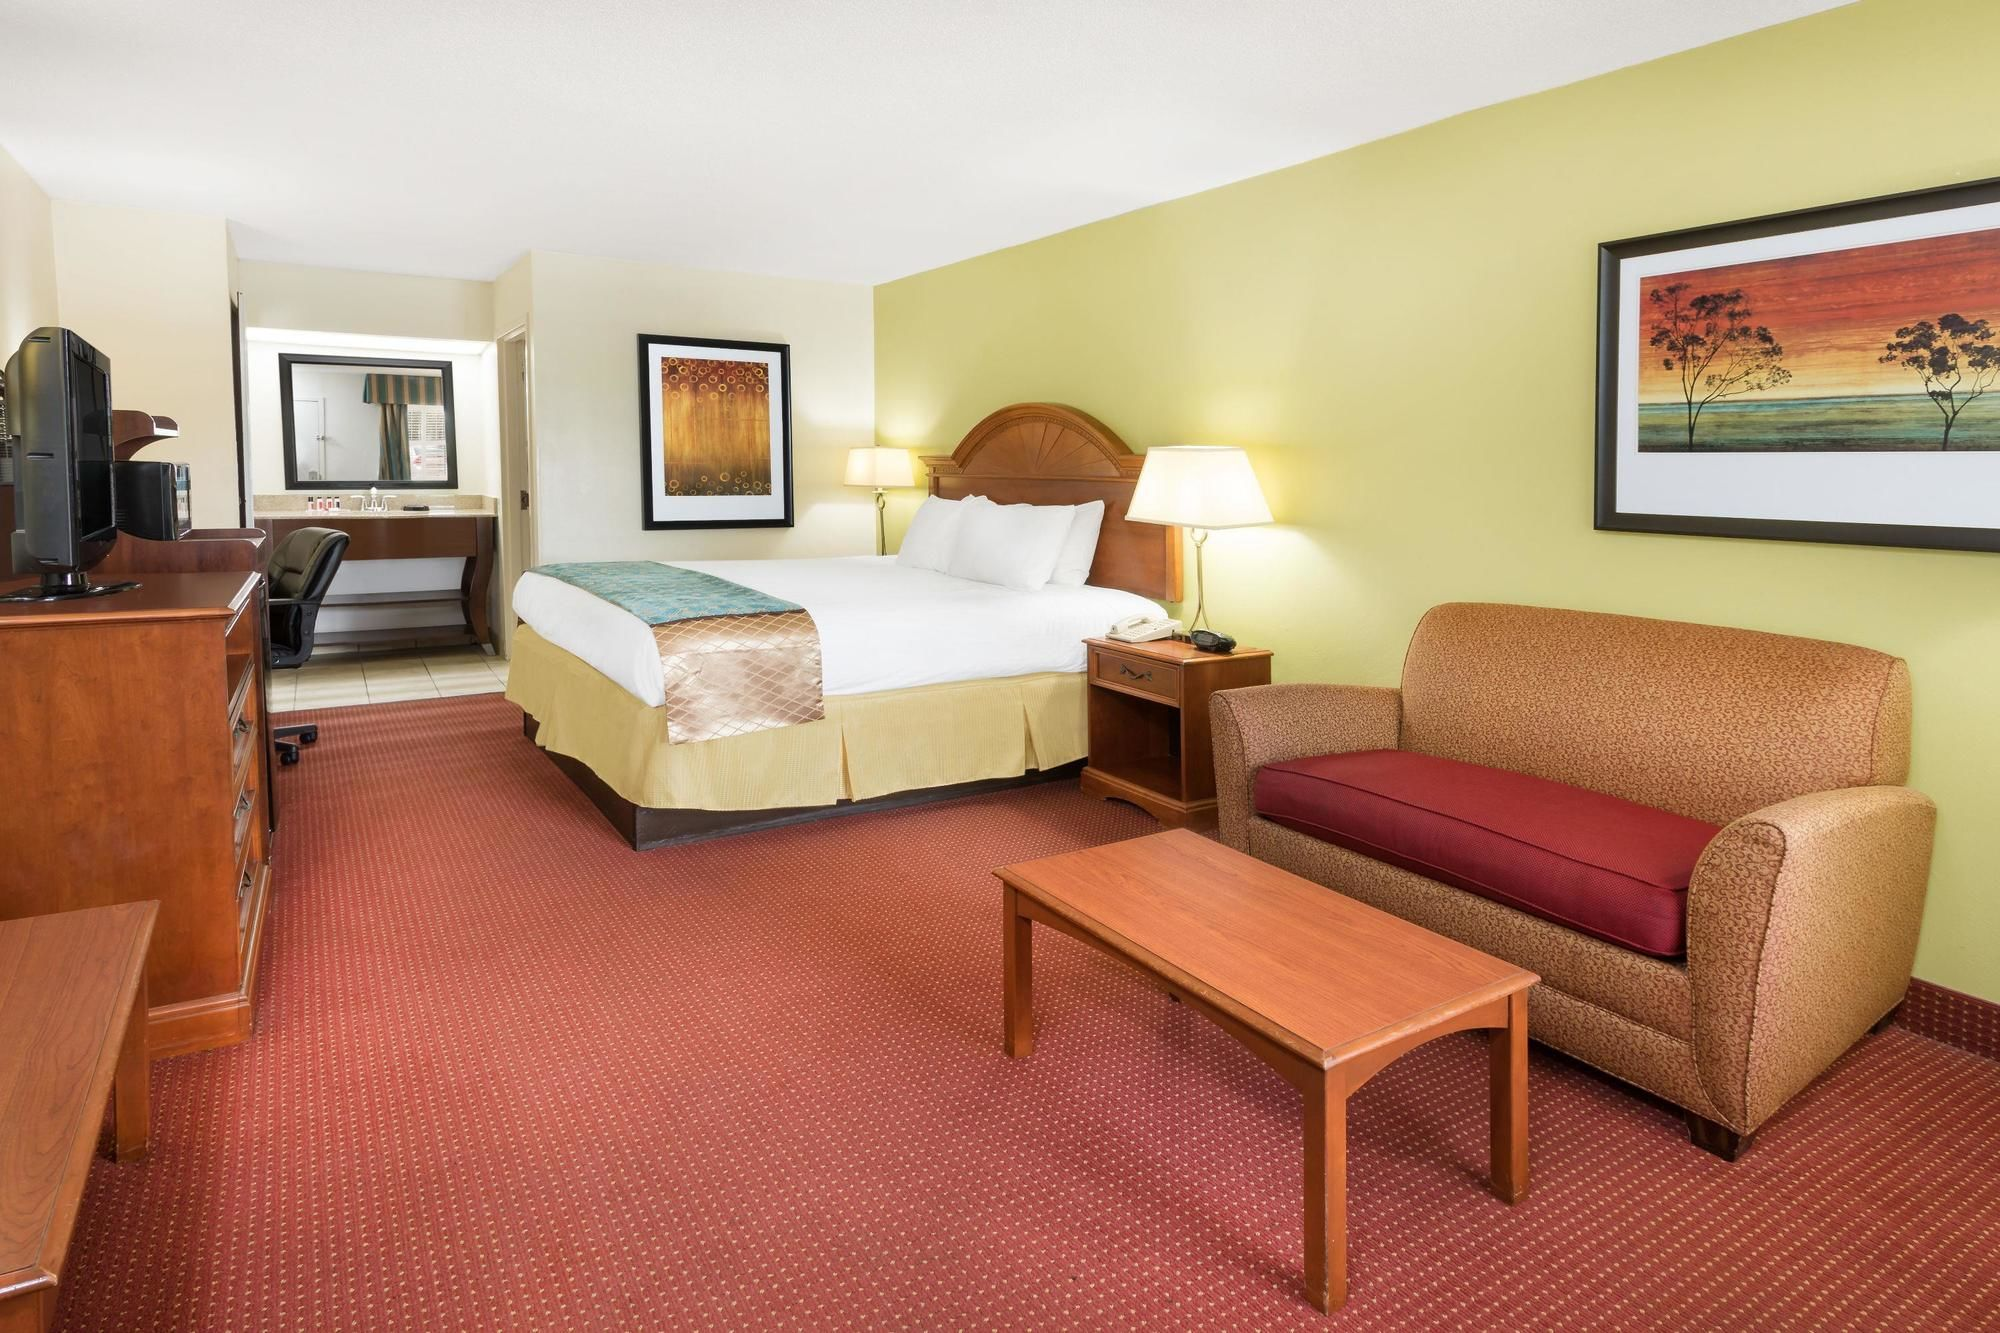 Baymont Inn & Suites Orangeburg North in Orangeburg, SC